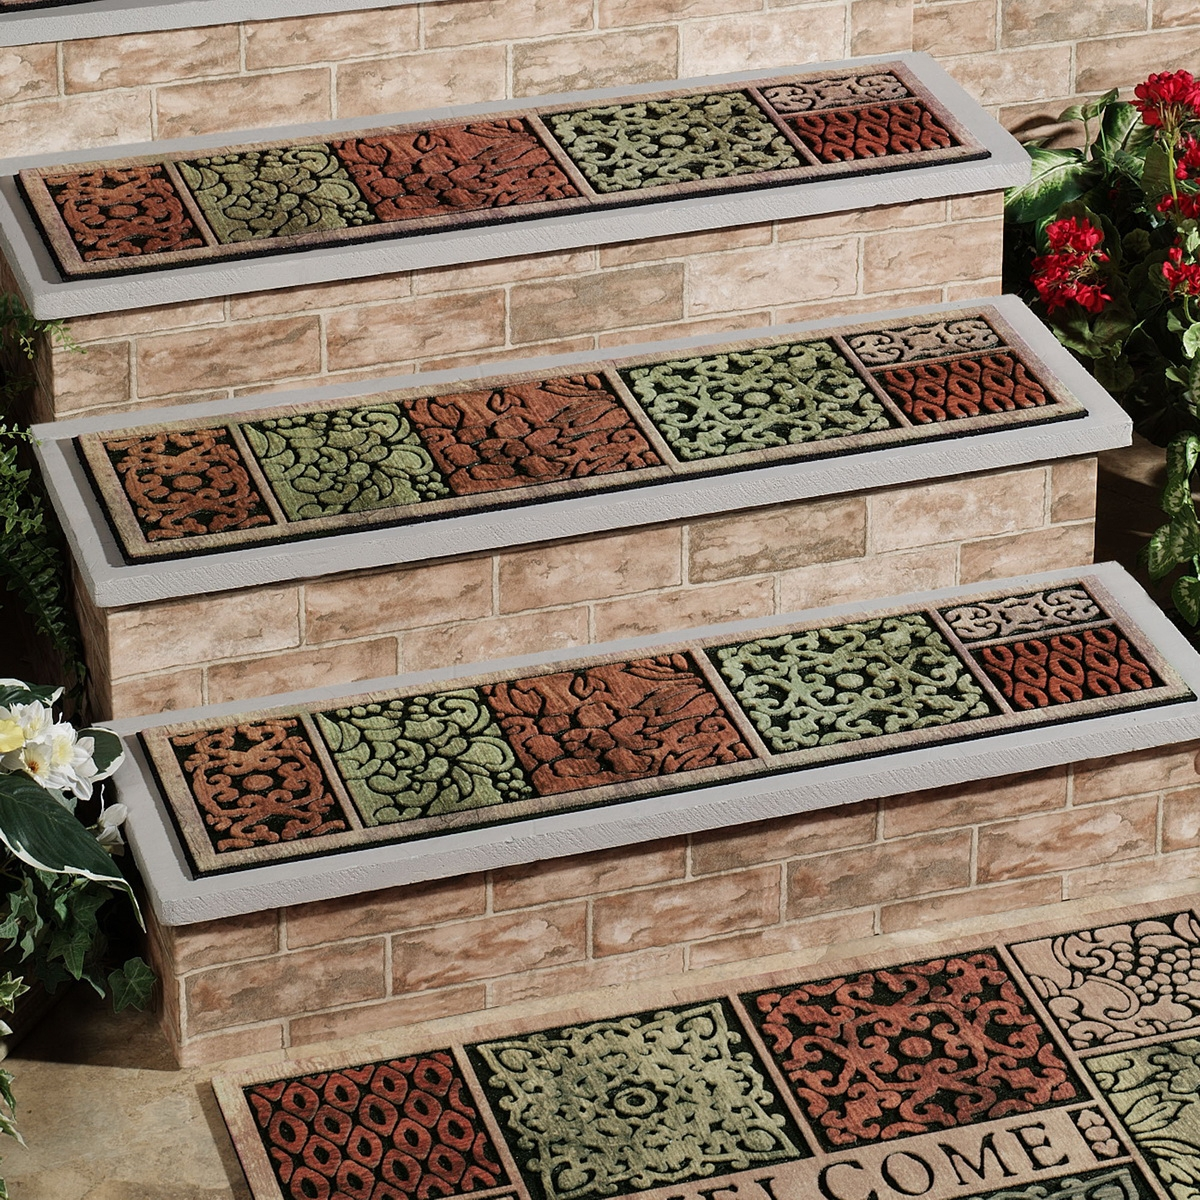 20 Best Ideas Of Decorative Stair Treads